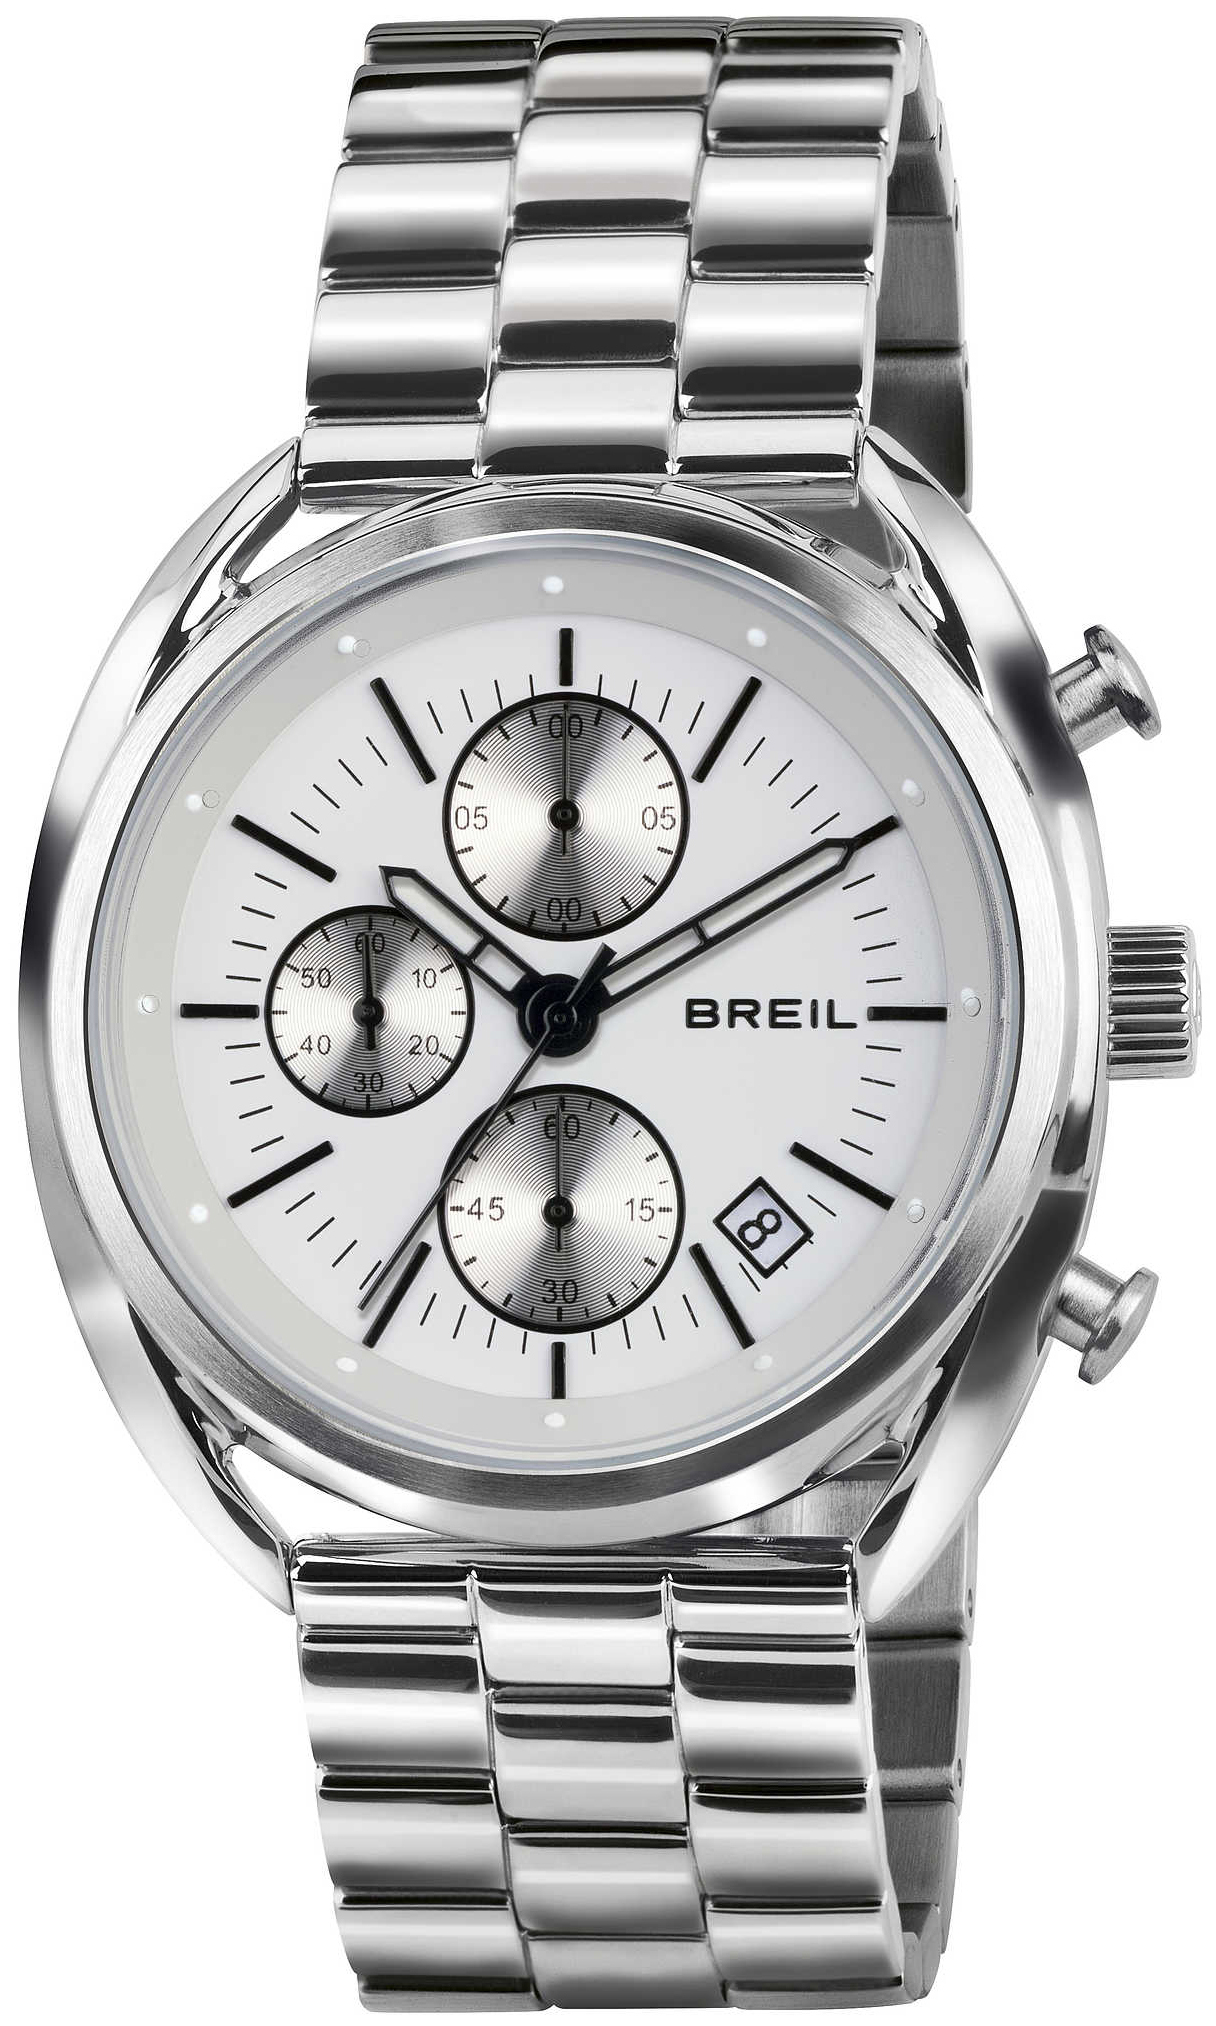 Breil 99999 Herreklokke TW1518 Hvit/Stål Ø42 mm - Breil